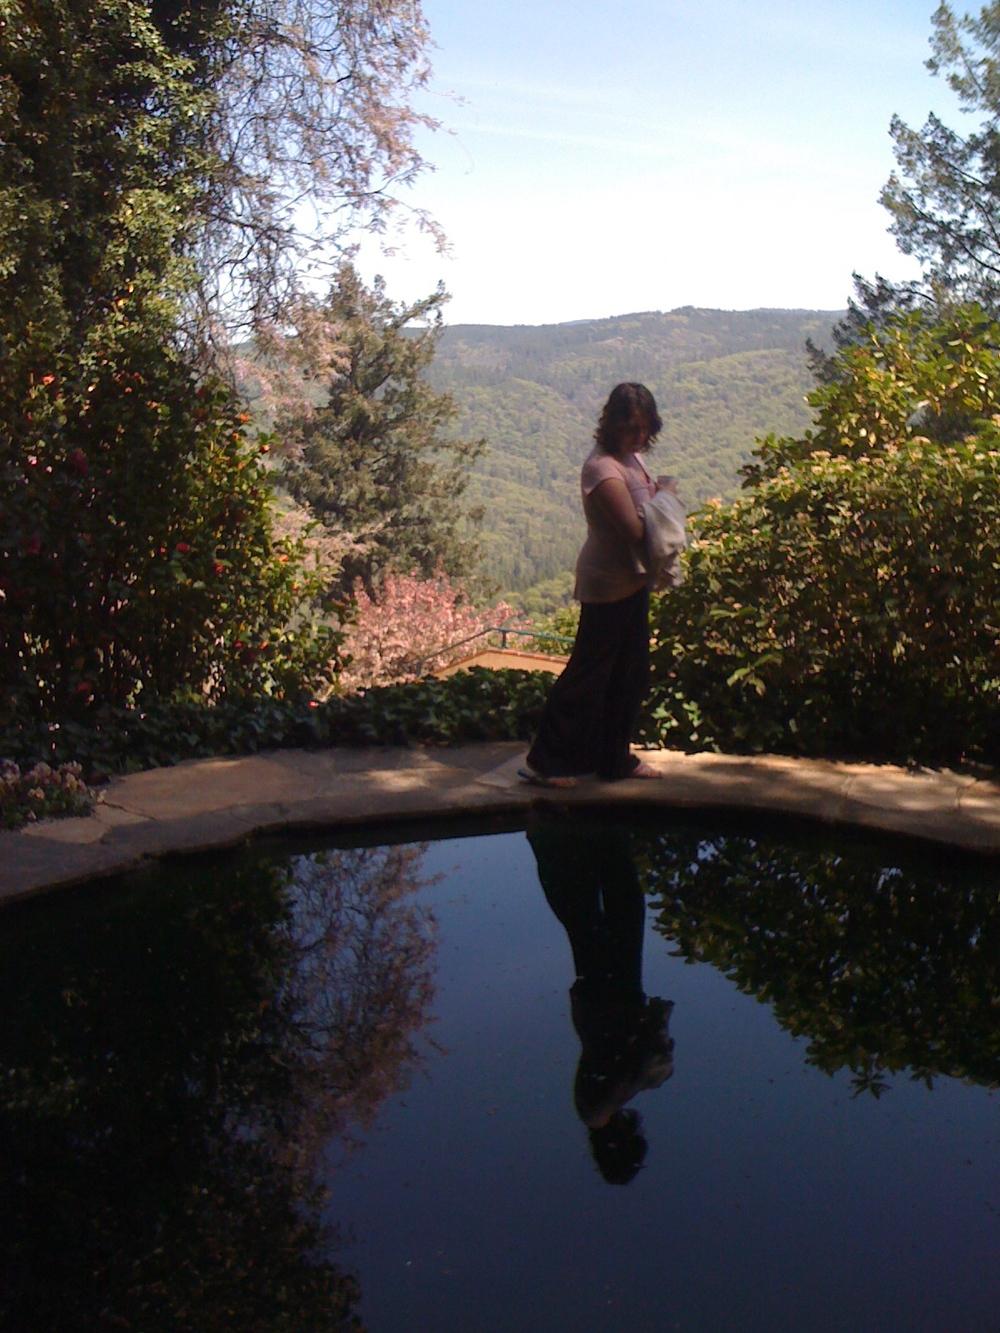 Jill looks into the pond at Ananda Tulip Gardens. Nevada City, California. 25 April 2010.